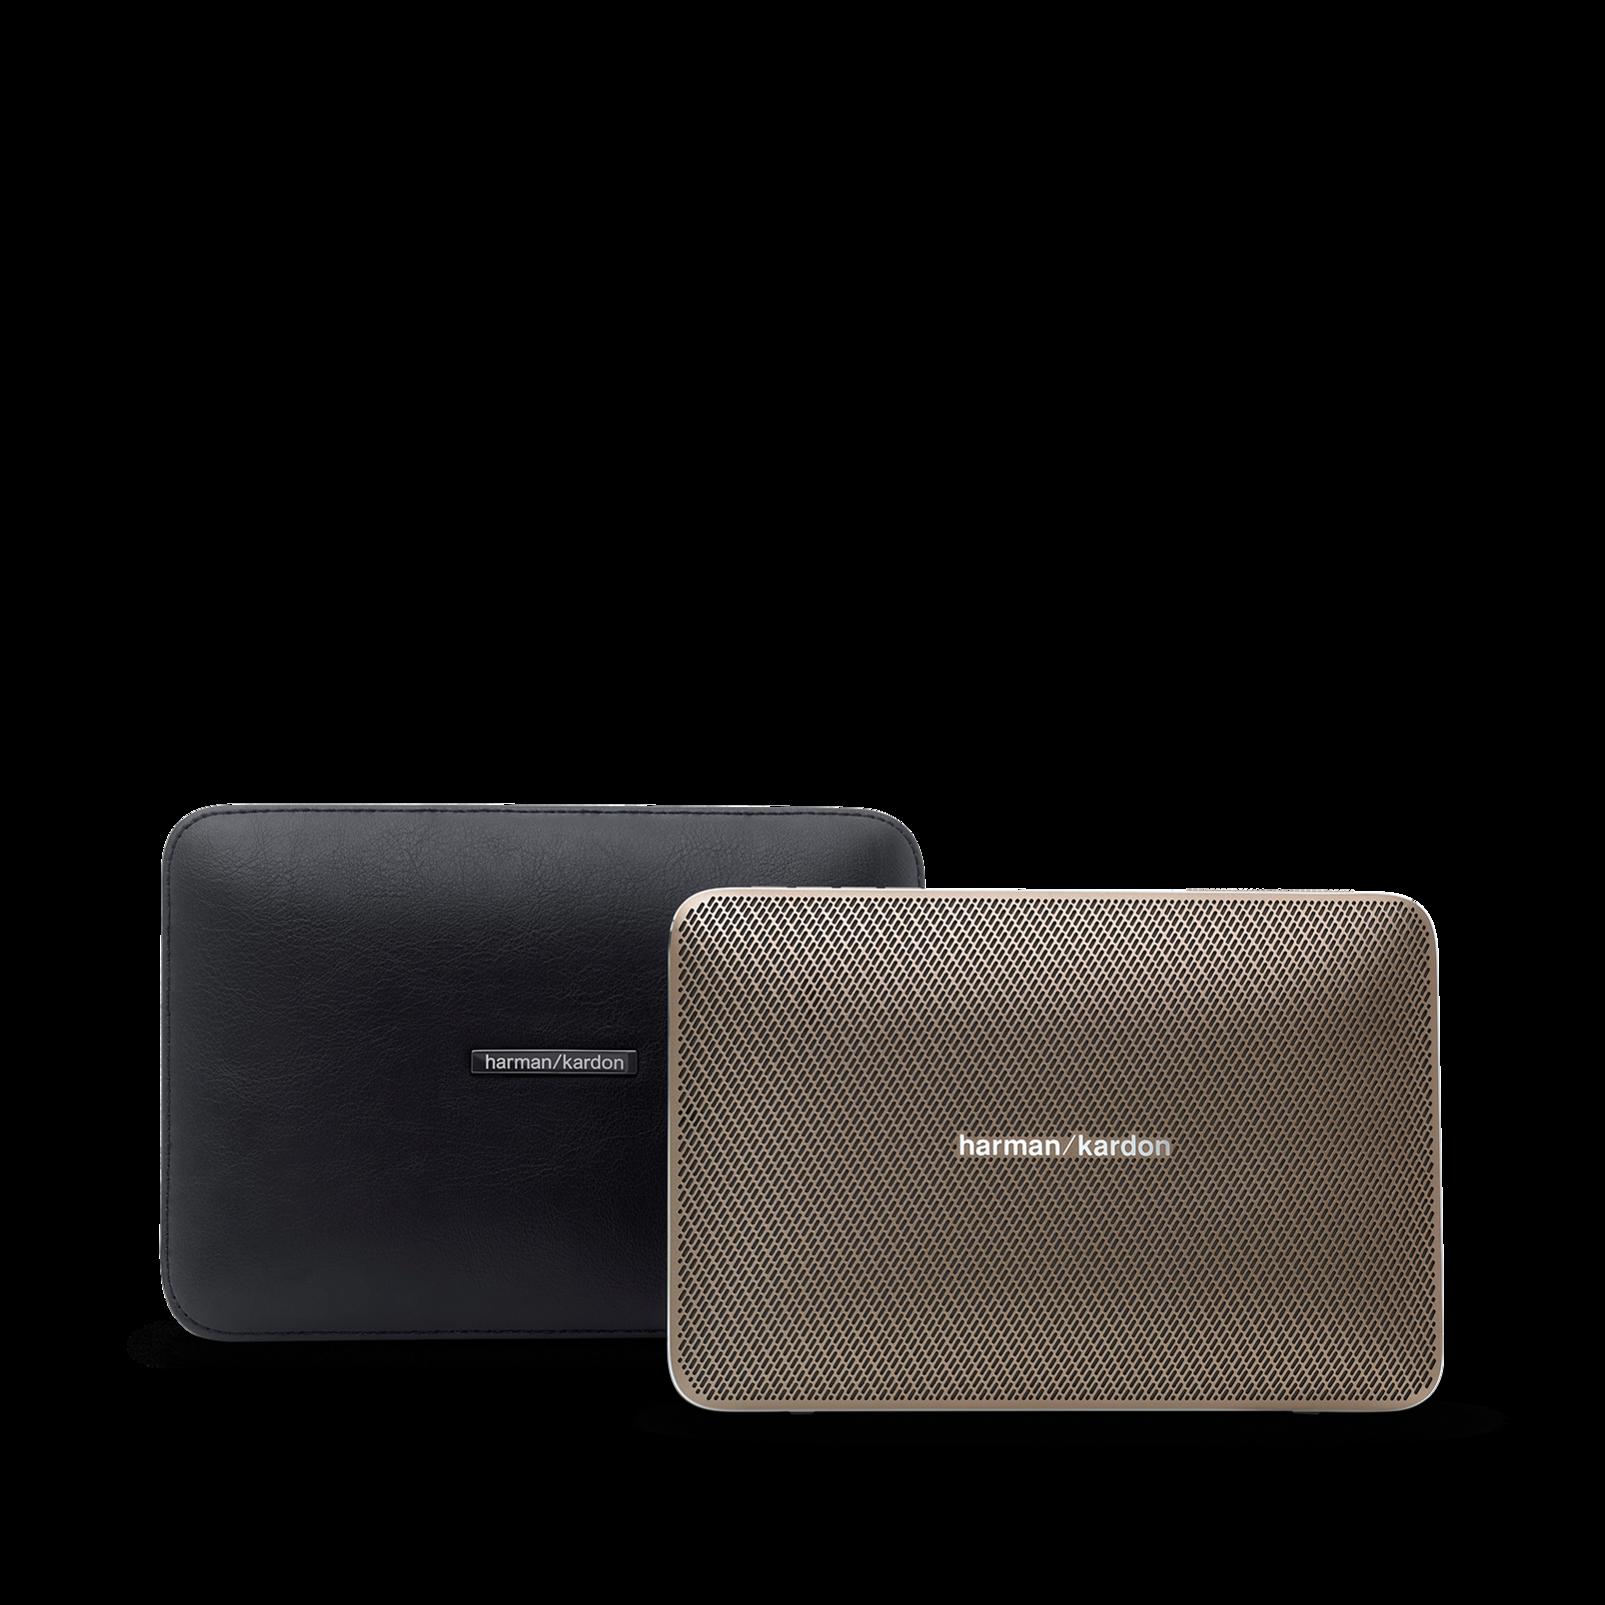 Esquire 2 Carrying Case - Black - Carrying case for Harman Kardon Esquire 2 - Hero